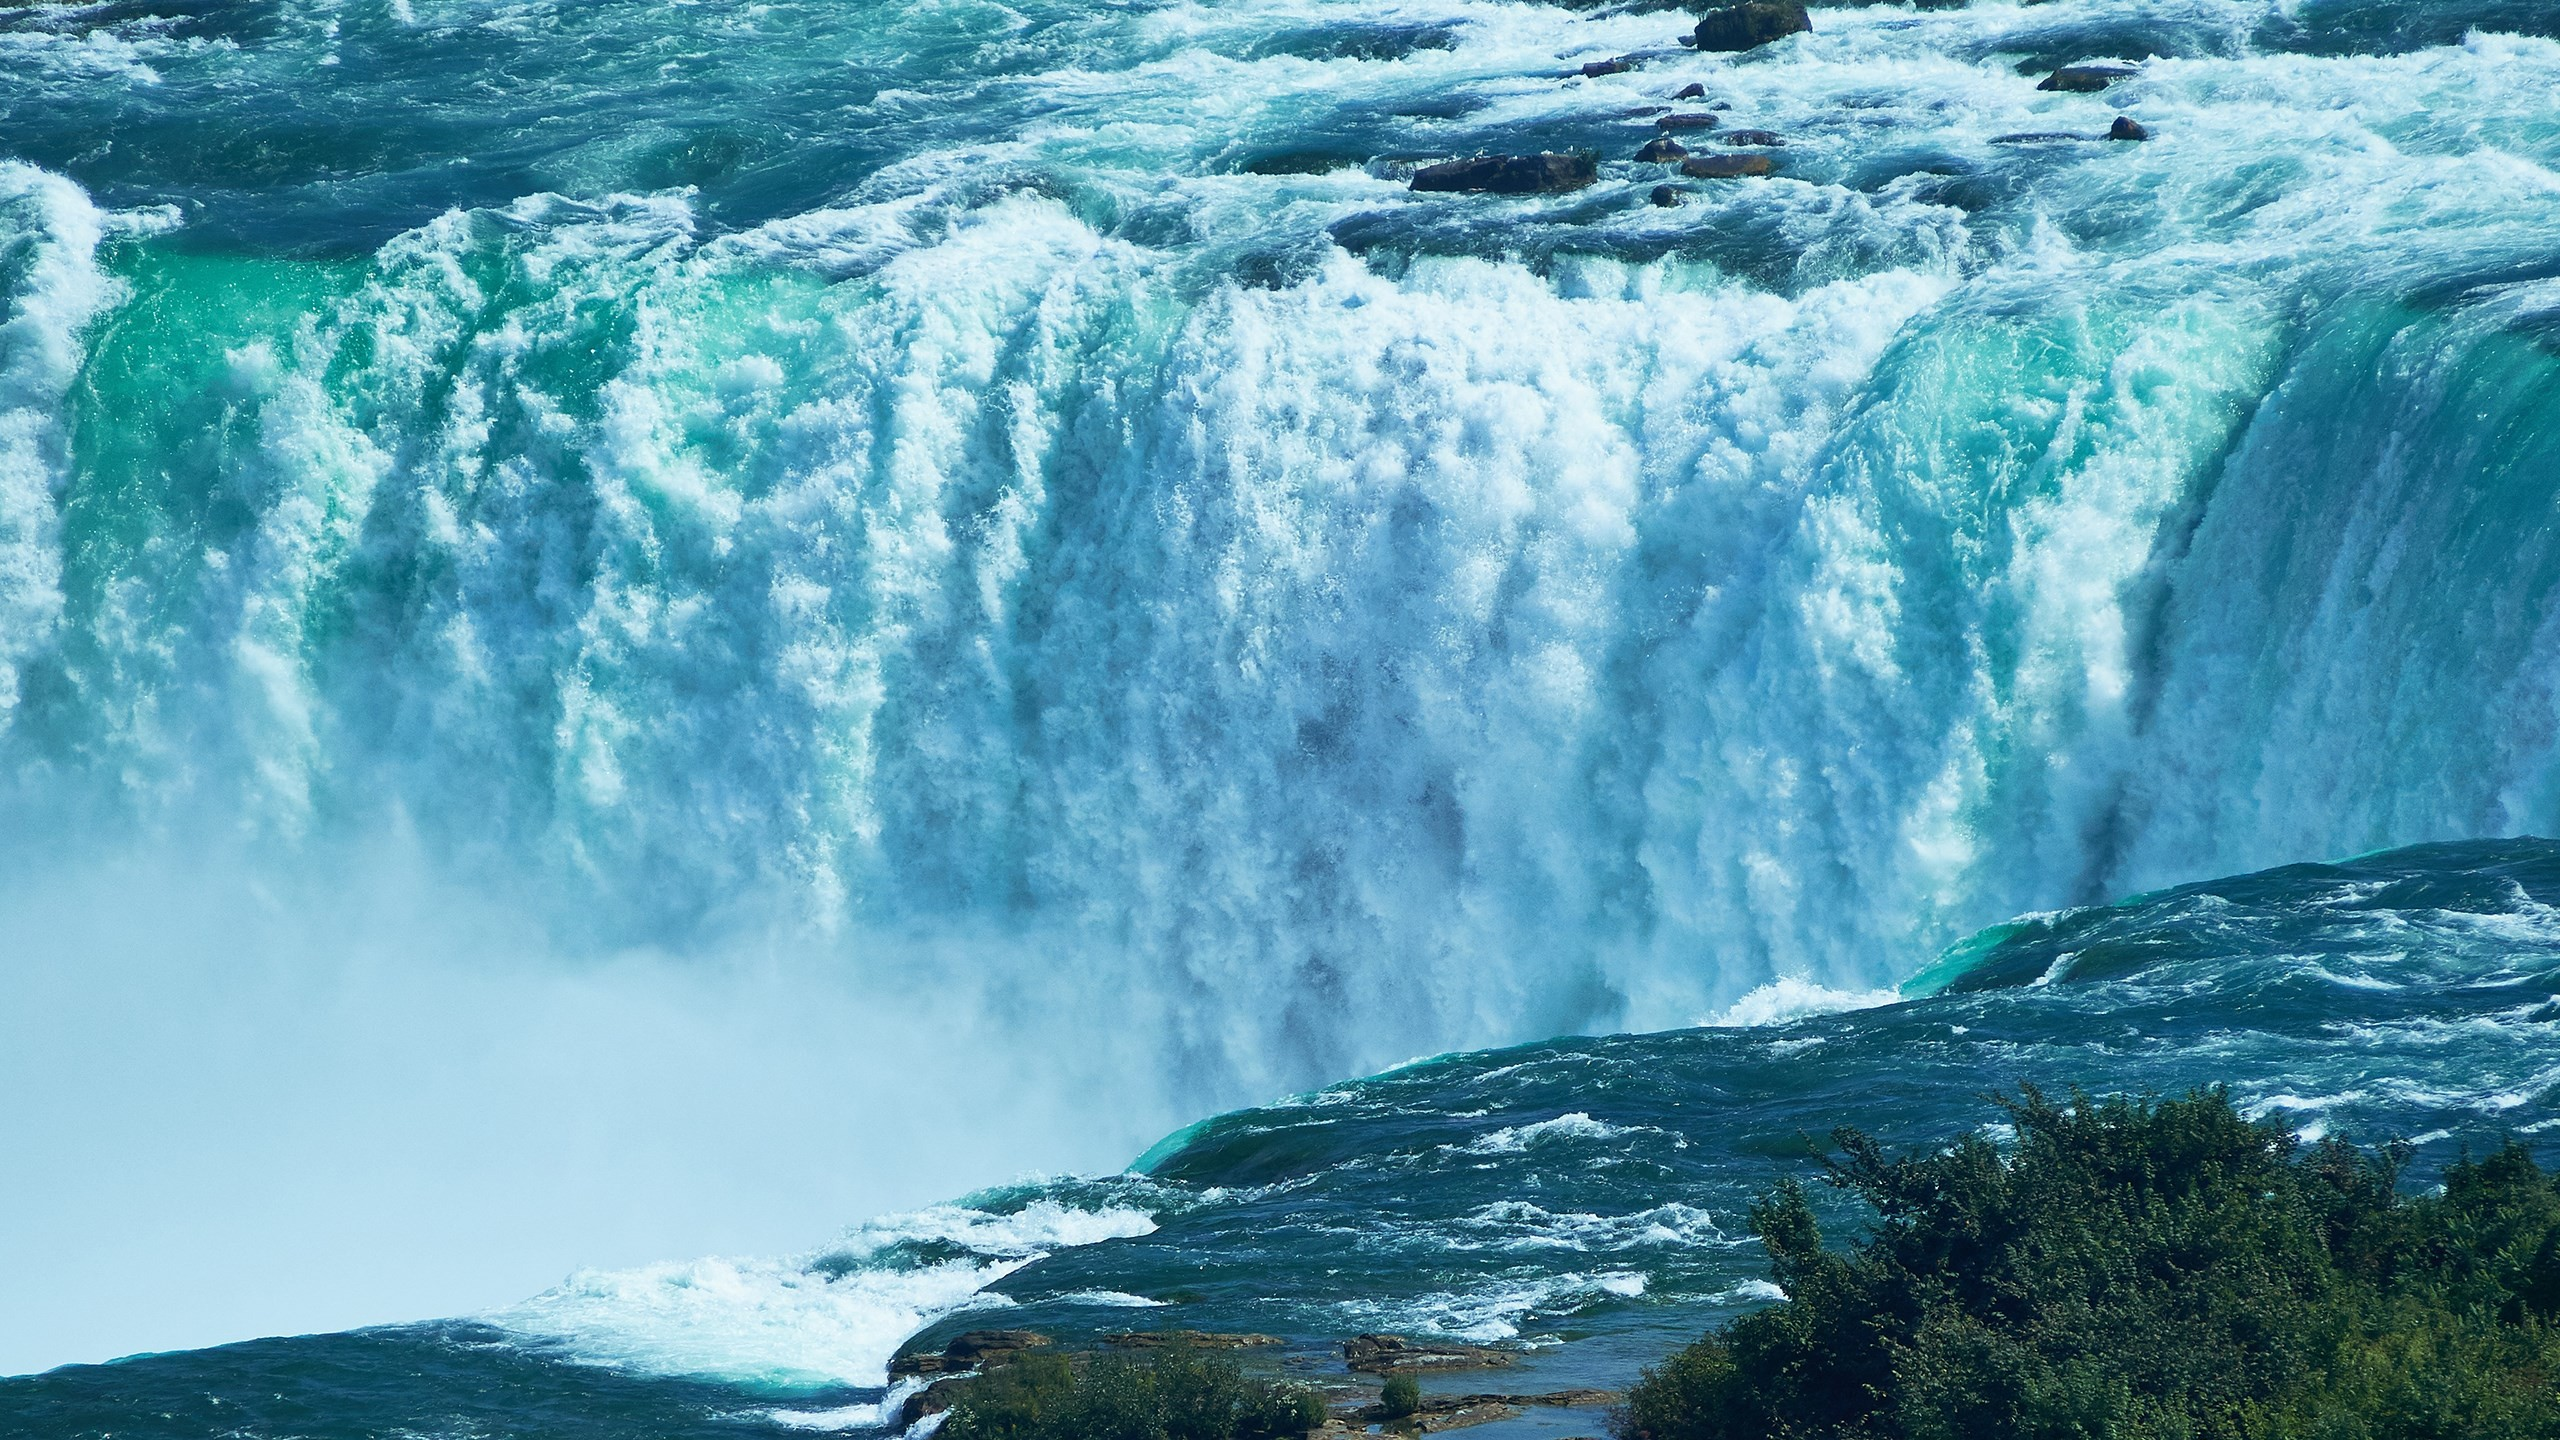 Niagara Falls Hd Wallpaper For Desktop Niagara Falls Background 183 ① Wallpapertag